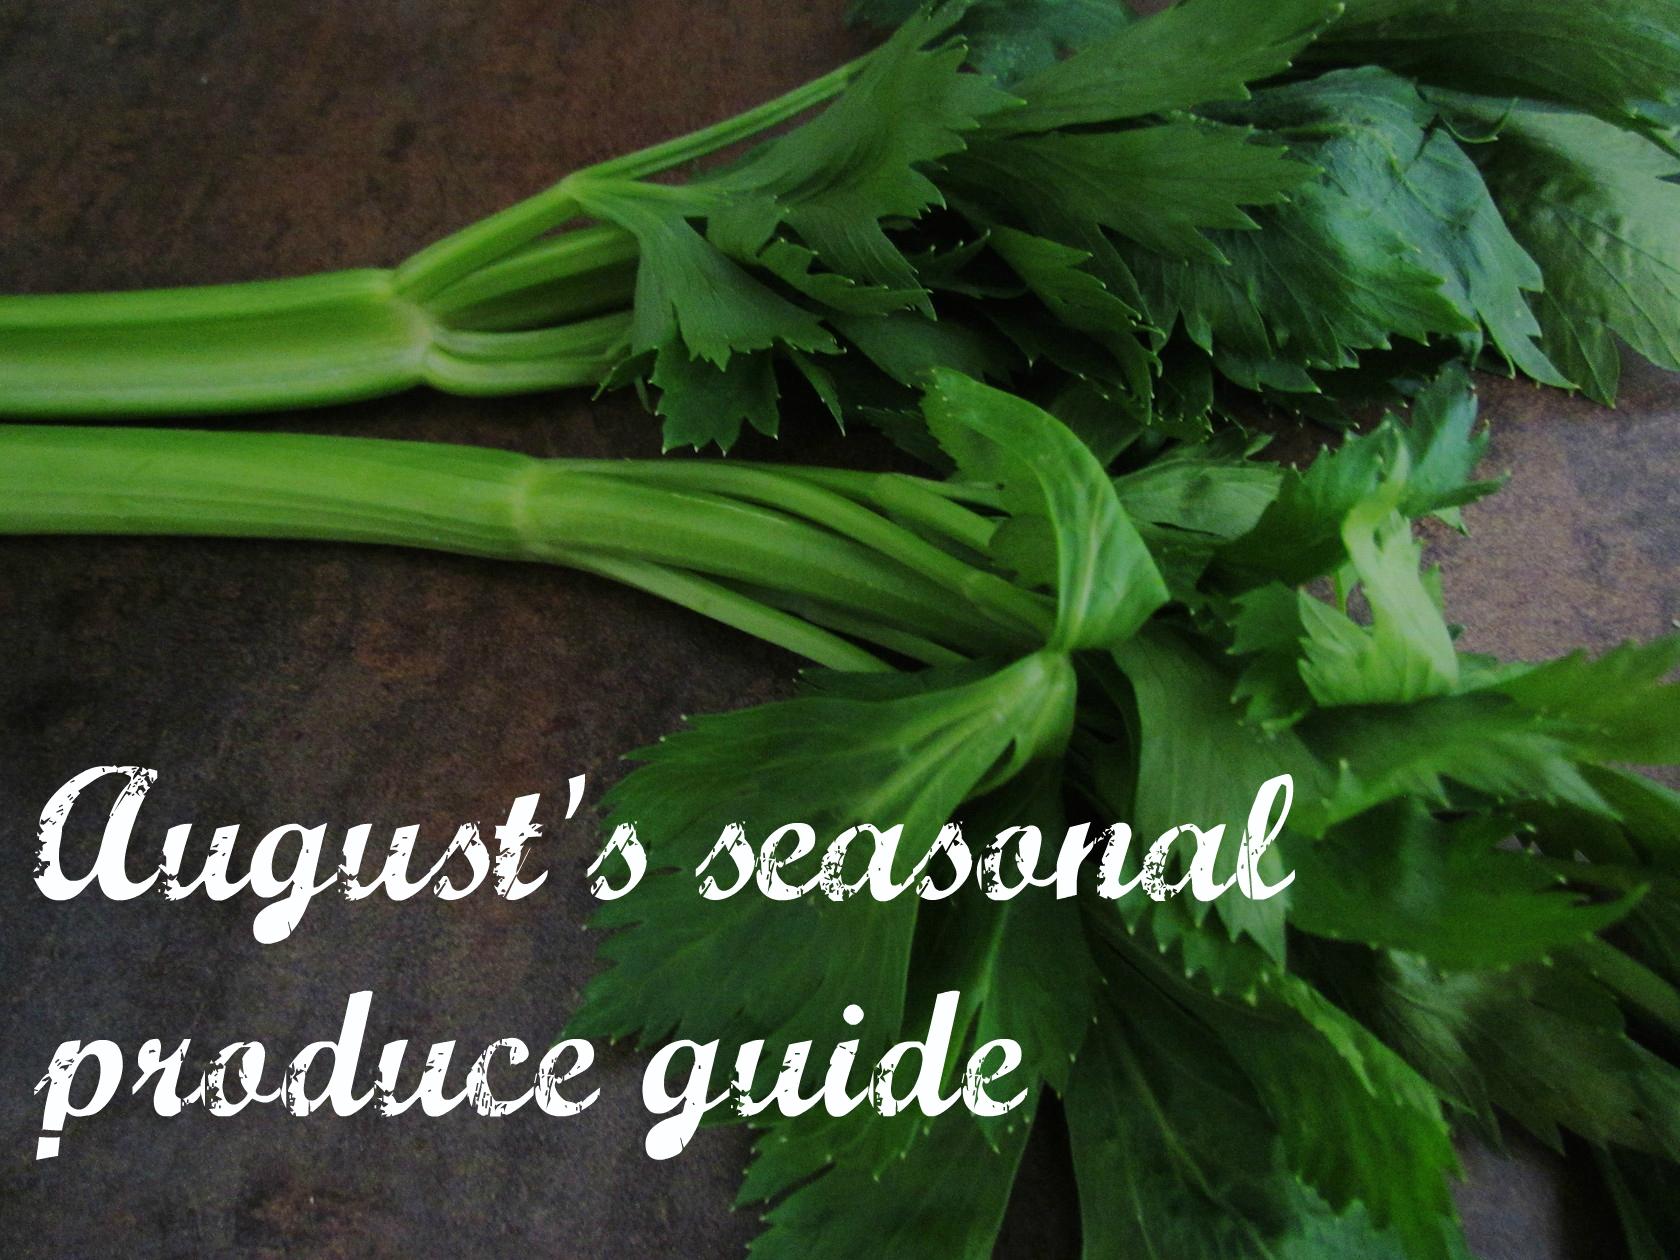 seasonal produce guide for switzerland: august